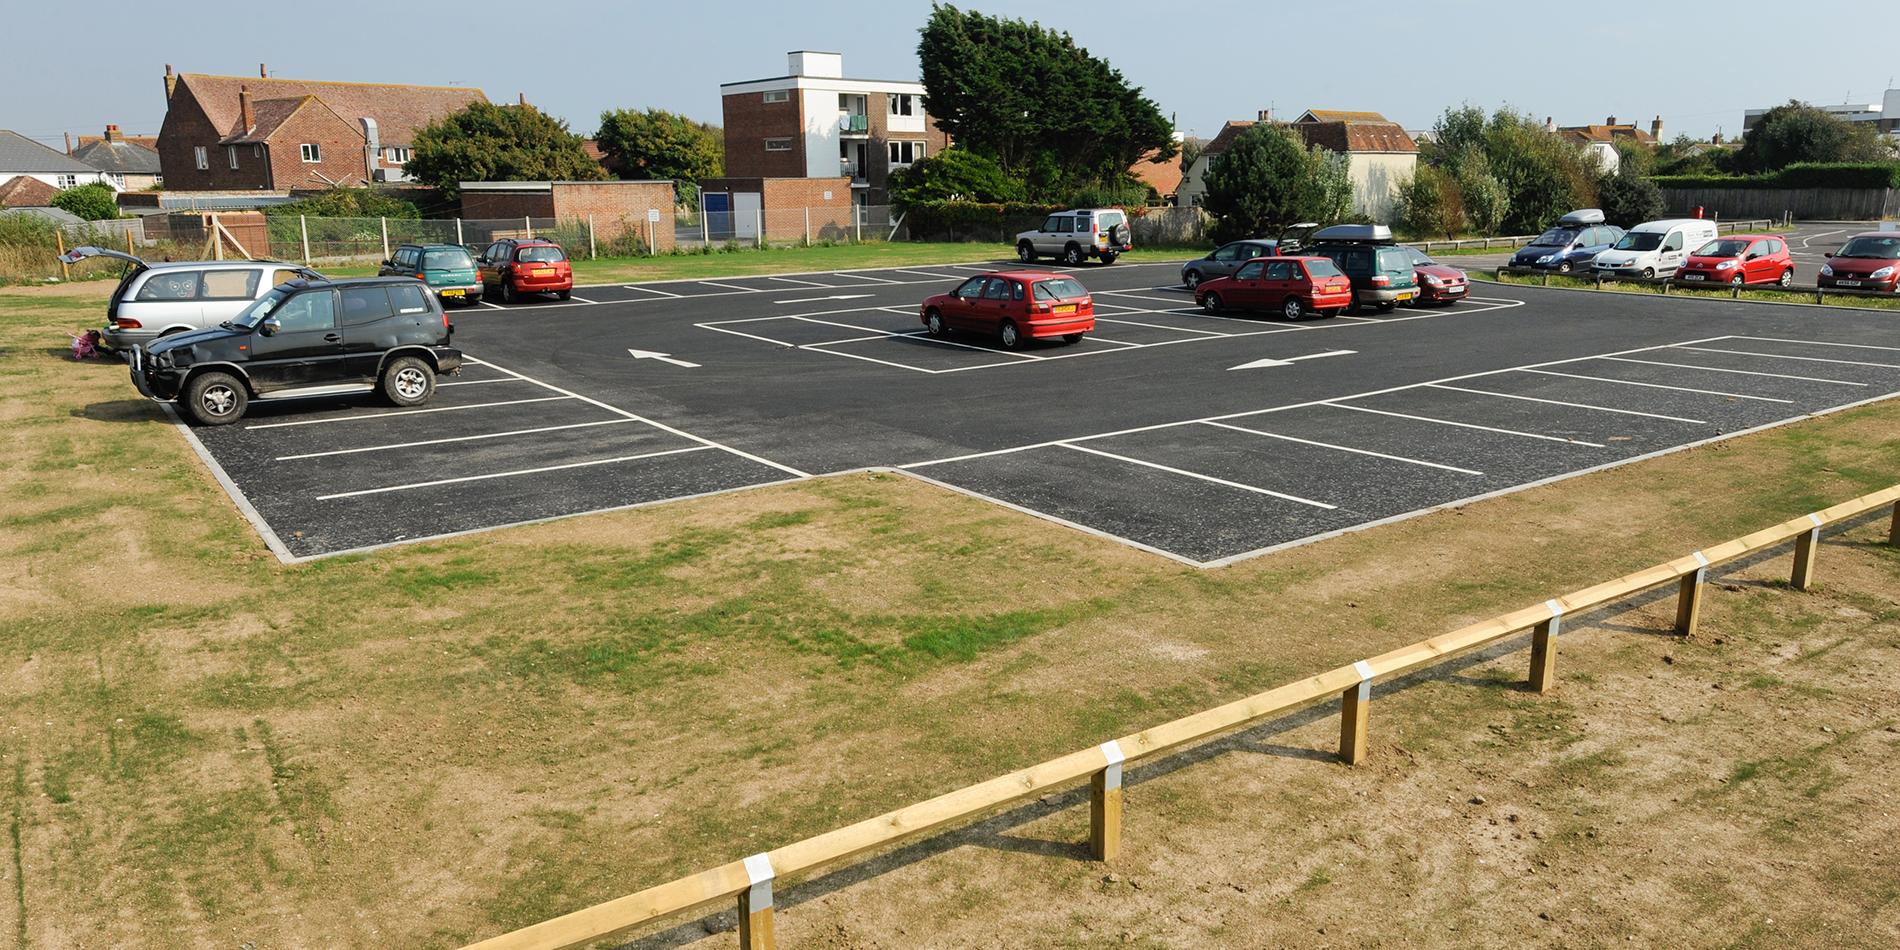 New Car parks